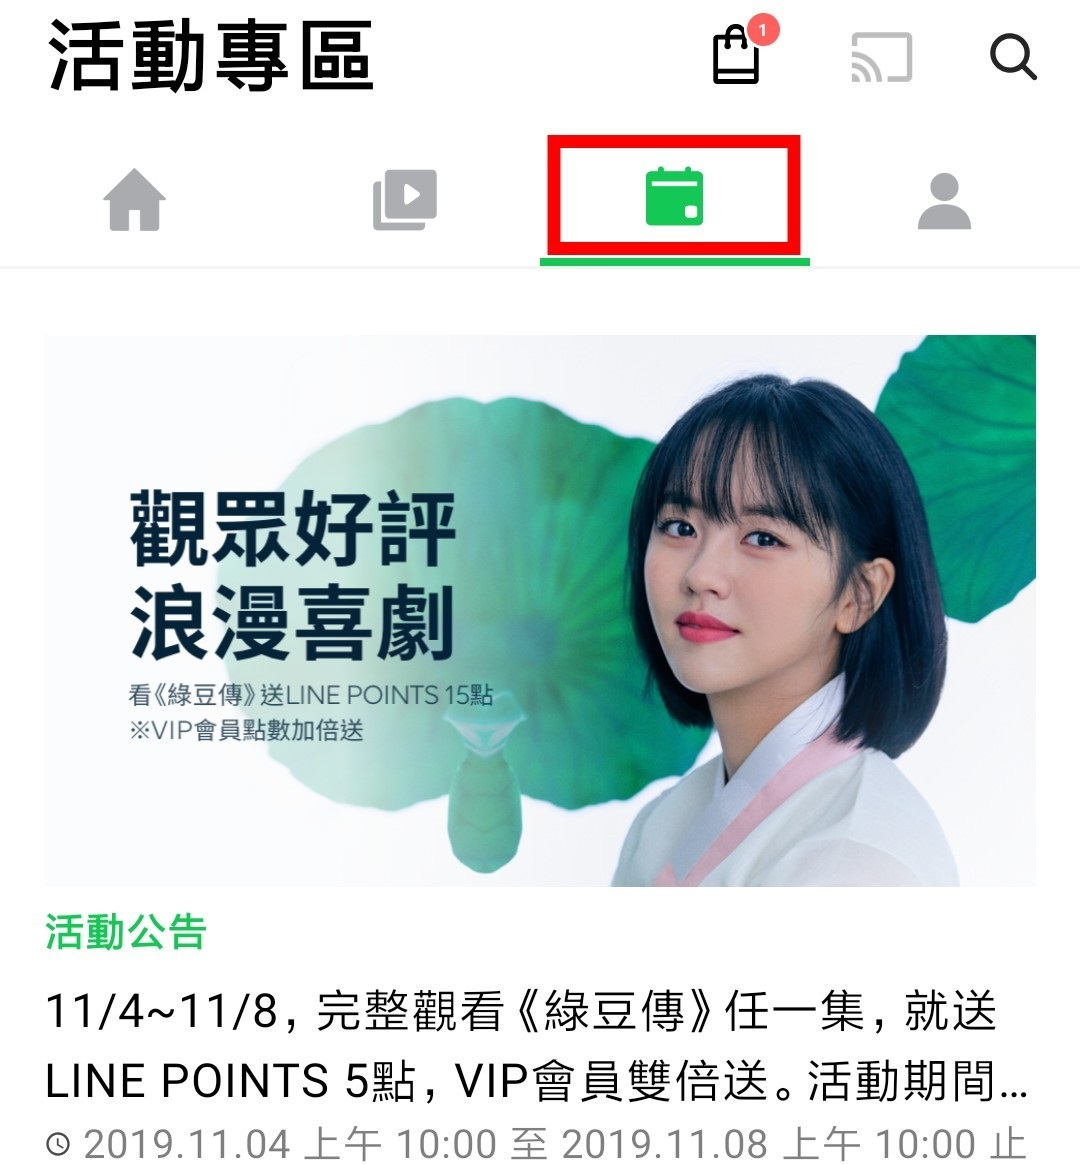 2019/11/4~11/14 LINE Points免費代幣 LINE品牌購物名店簽到 3點+LINE TV 15點 - LINE 綜合討論 - 冰楓論壇 - 綜合論壇.外掛 ...